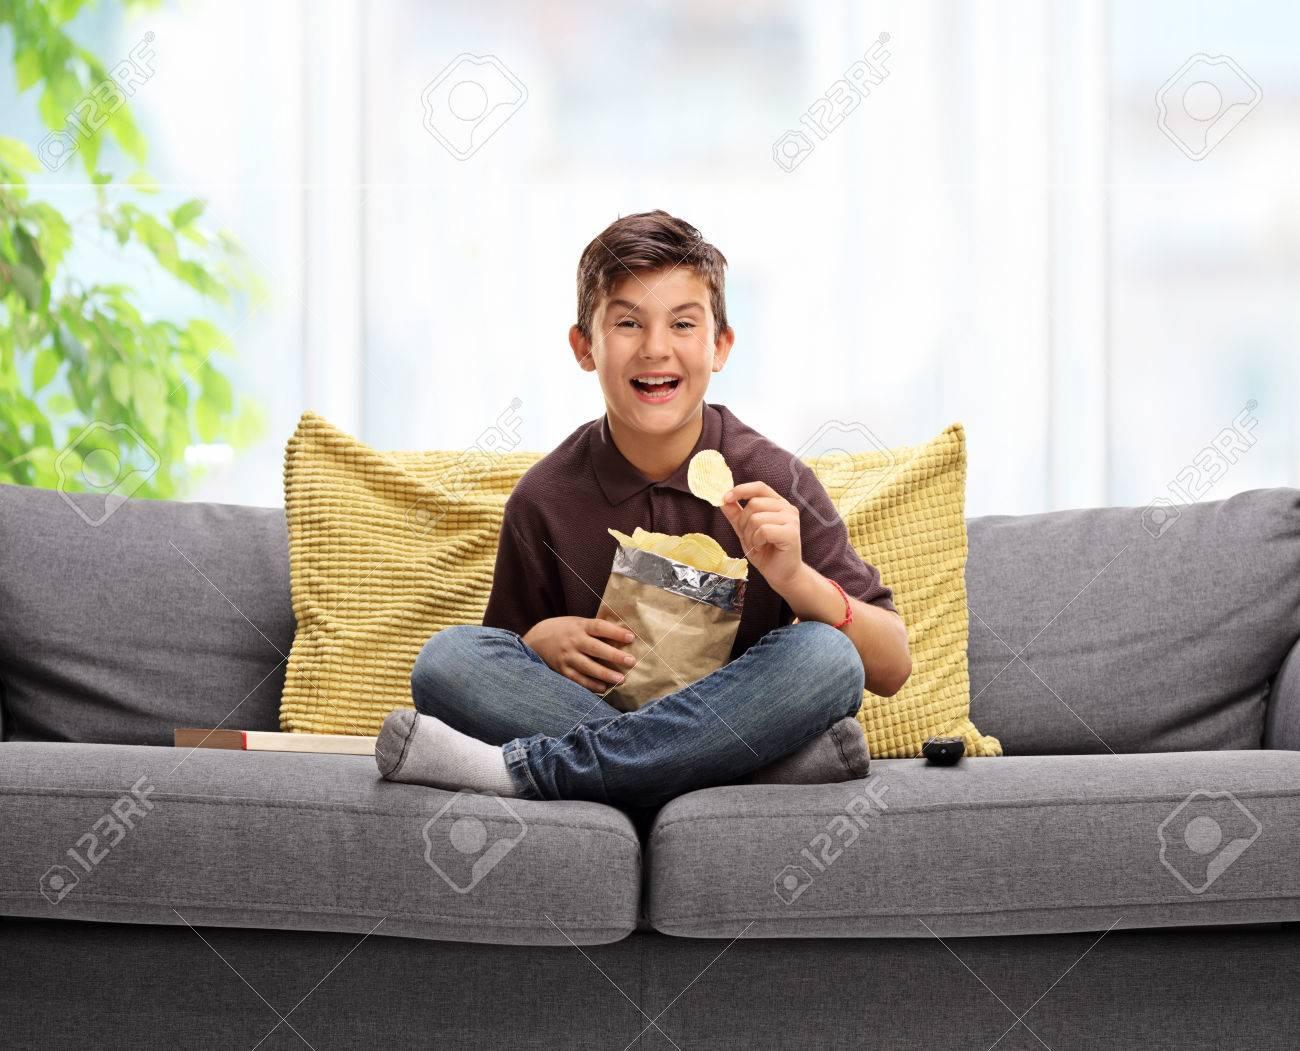 Joyful little boy sitting on a sofa and eating potato chips - 65941460